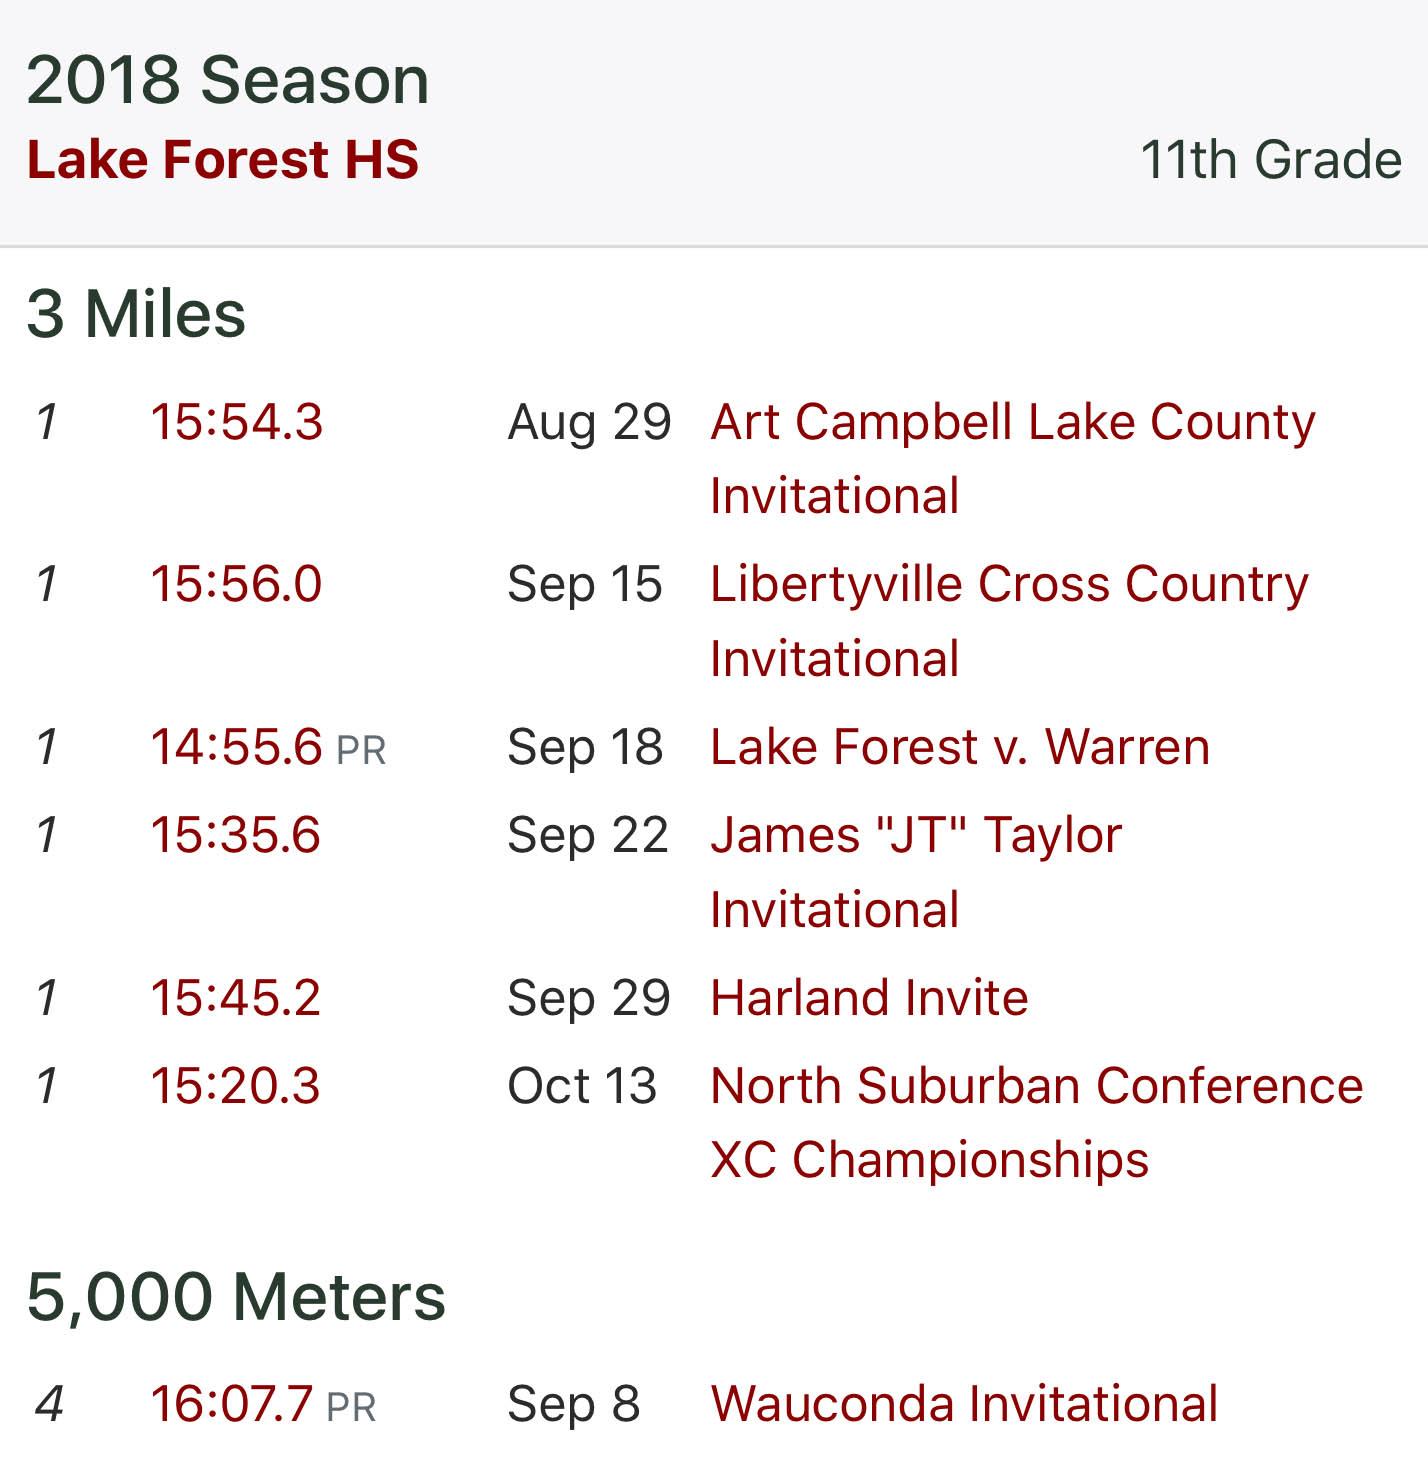 Nate's season record